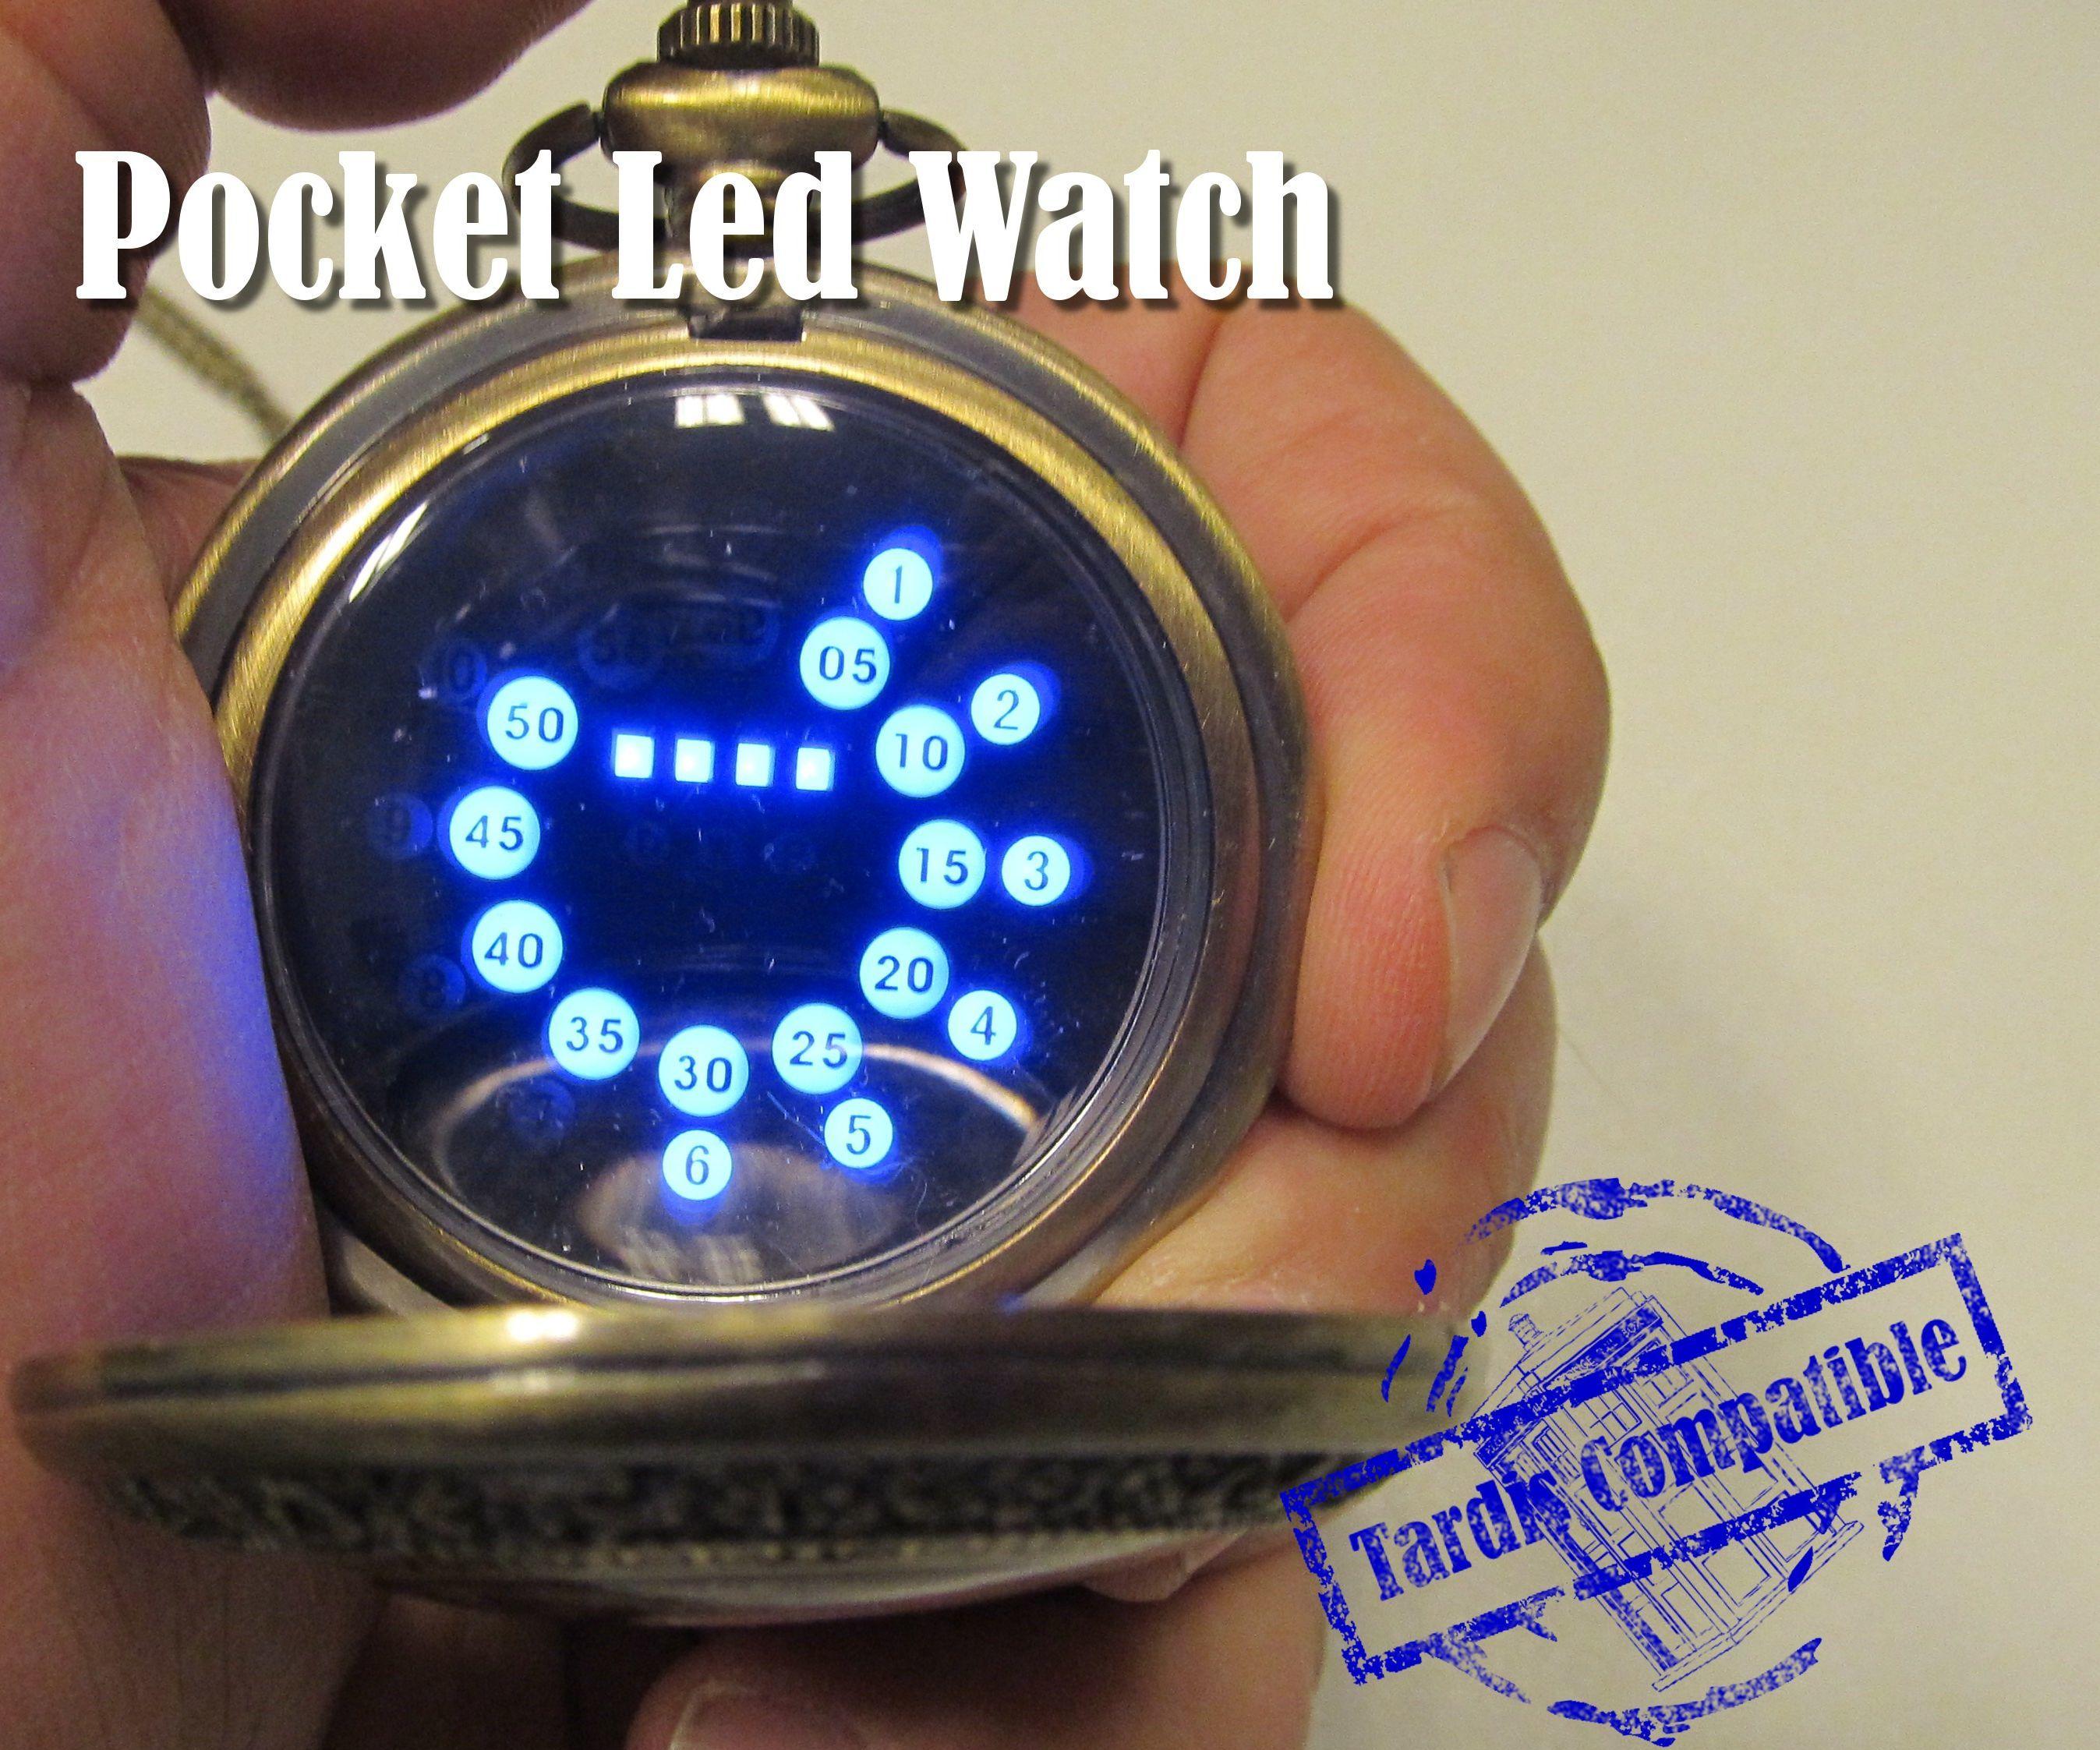 Led Pocket Watch, A Geeky One